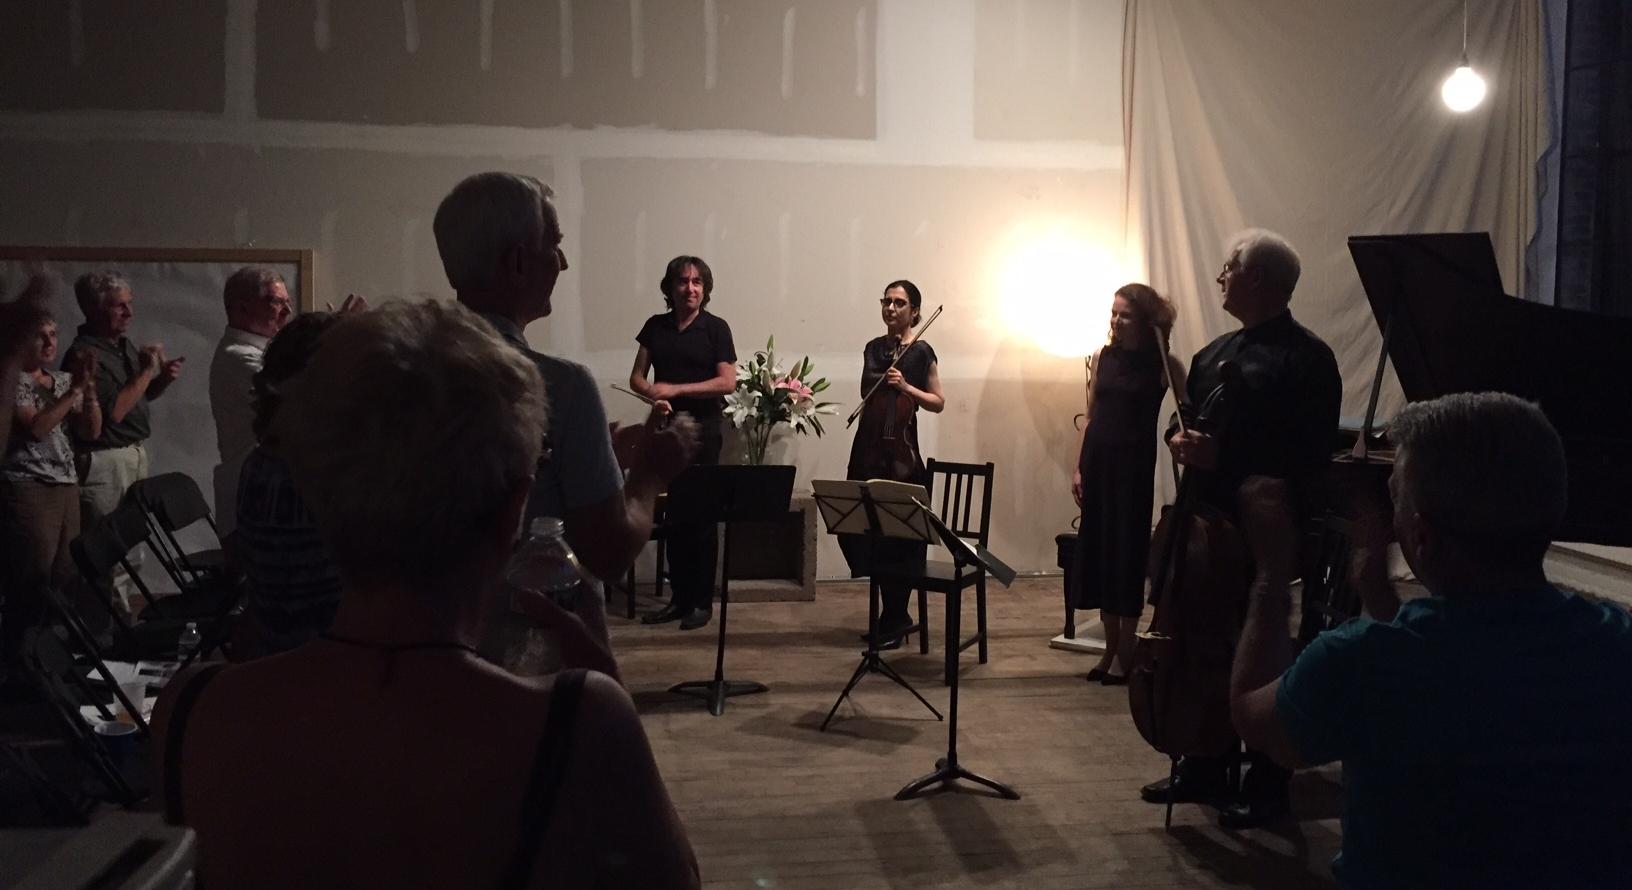 After Brahms Quartet peformance, at the Newburgh Music Festival.